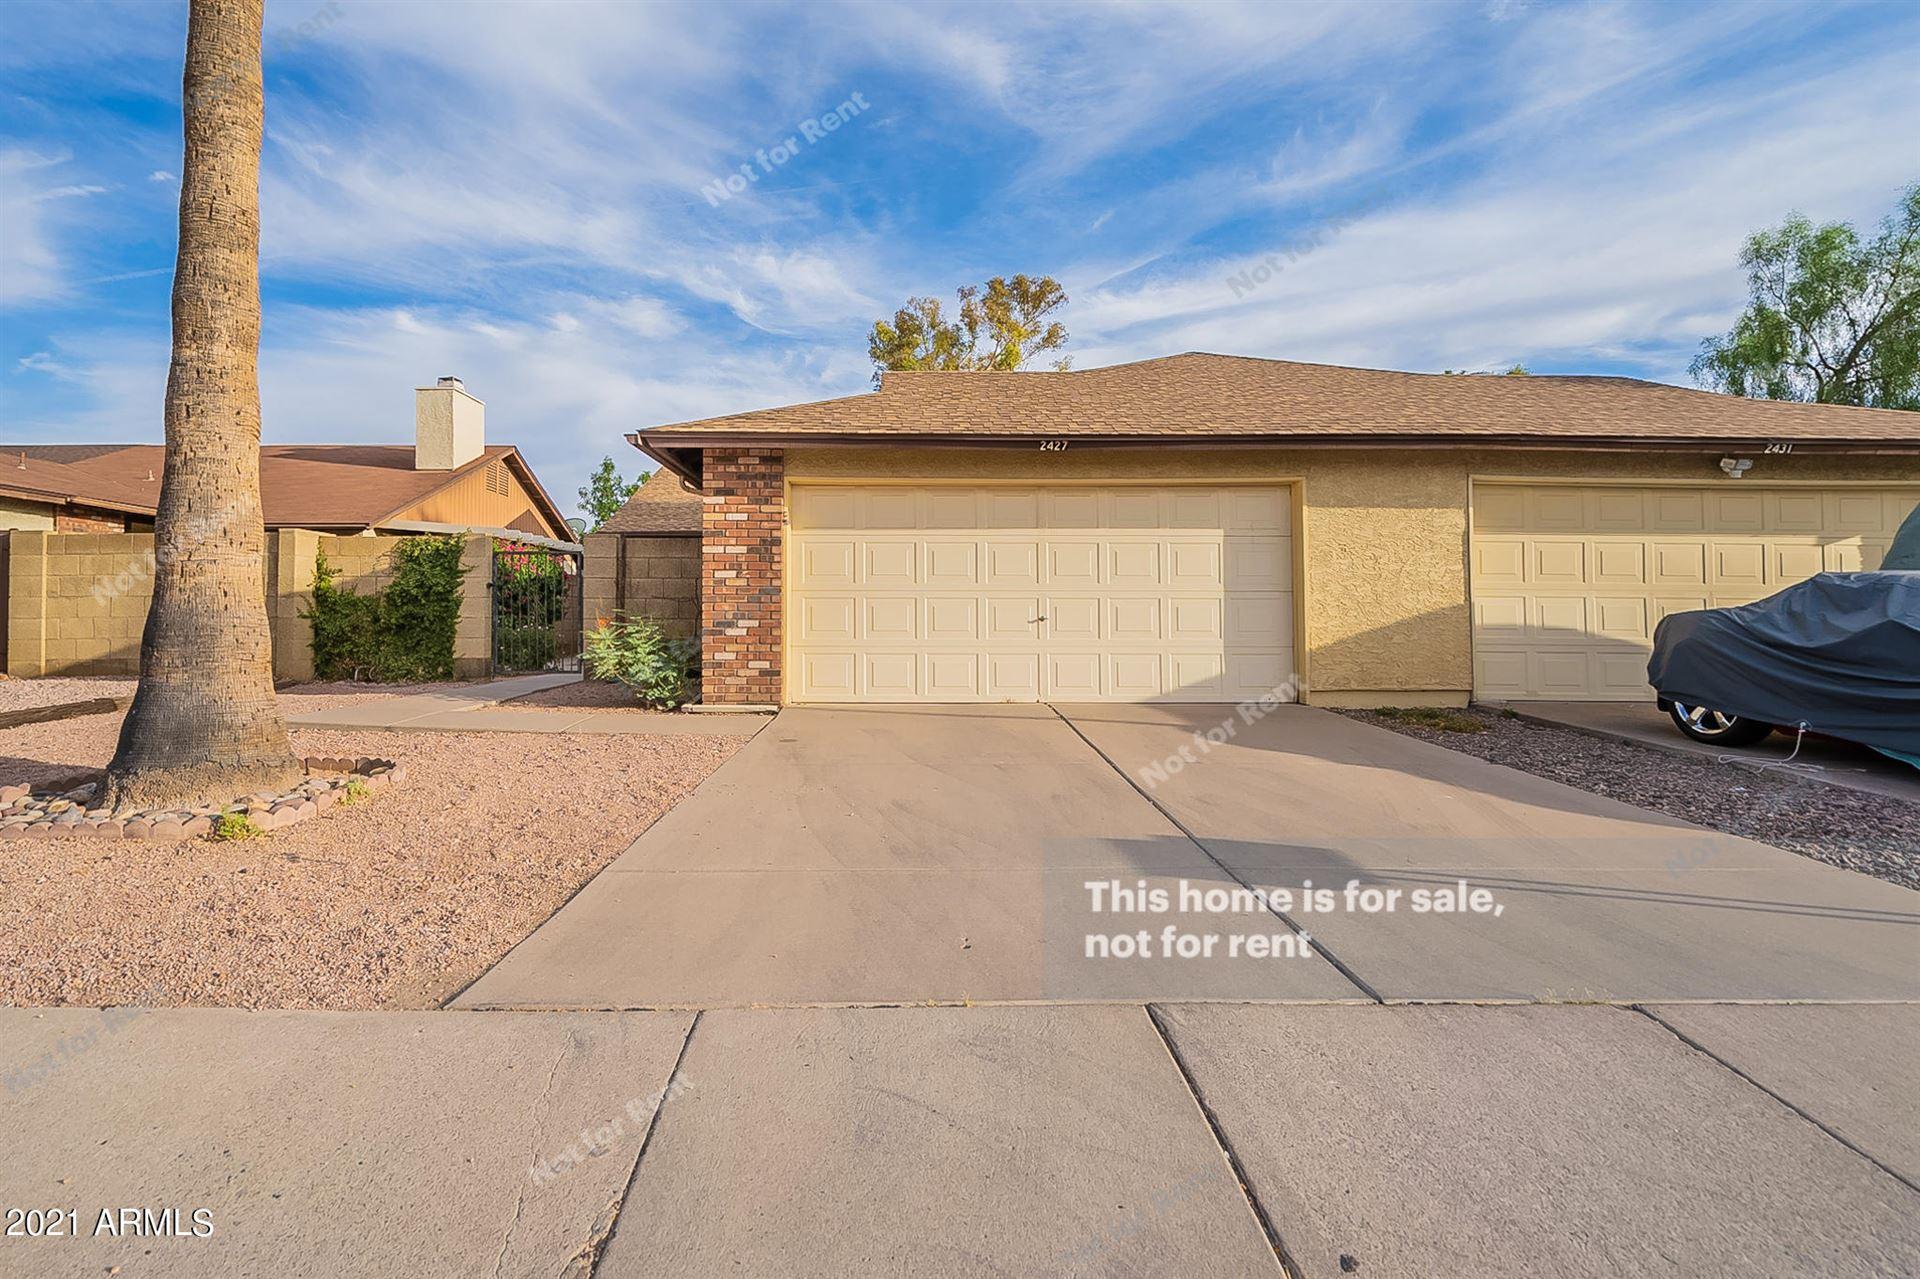 2427 W KNOWLES Avenue, Mesa, AZ 85202 - MLS#: 6247347